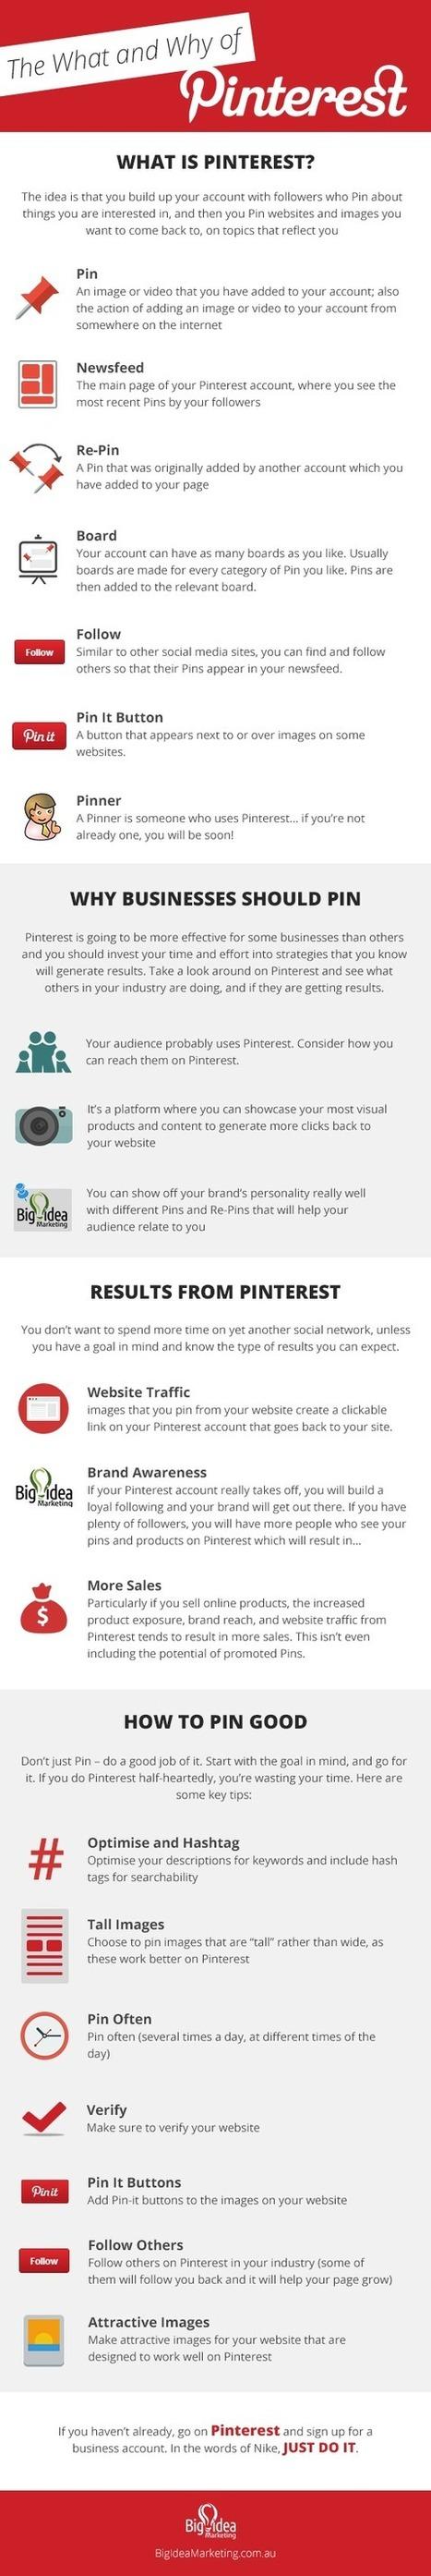 Qué y por qué de Pinterest para tu empresa #infografia #infographic #socialmedia | Seo, Social Media Marketing | Scoop.it